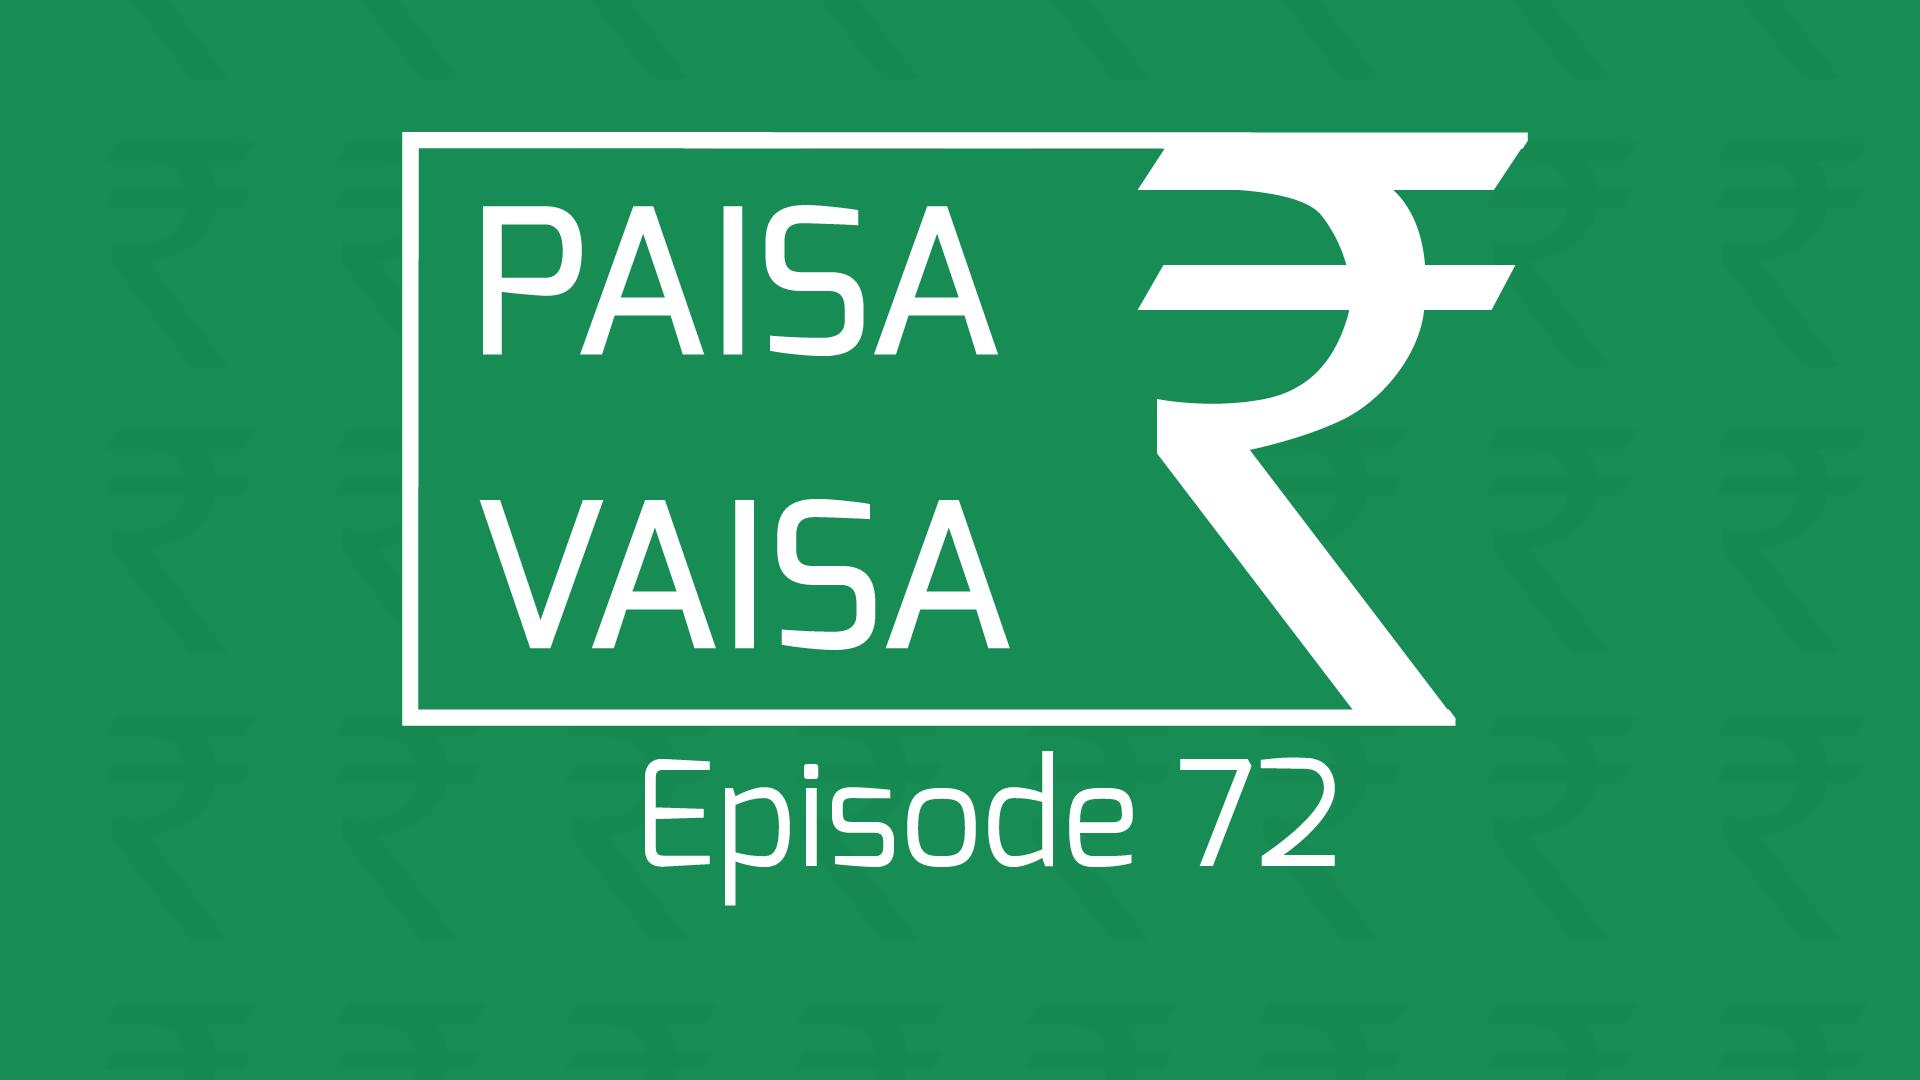 PaisaVaisaEpisode72.png